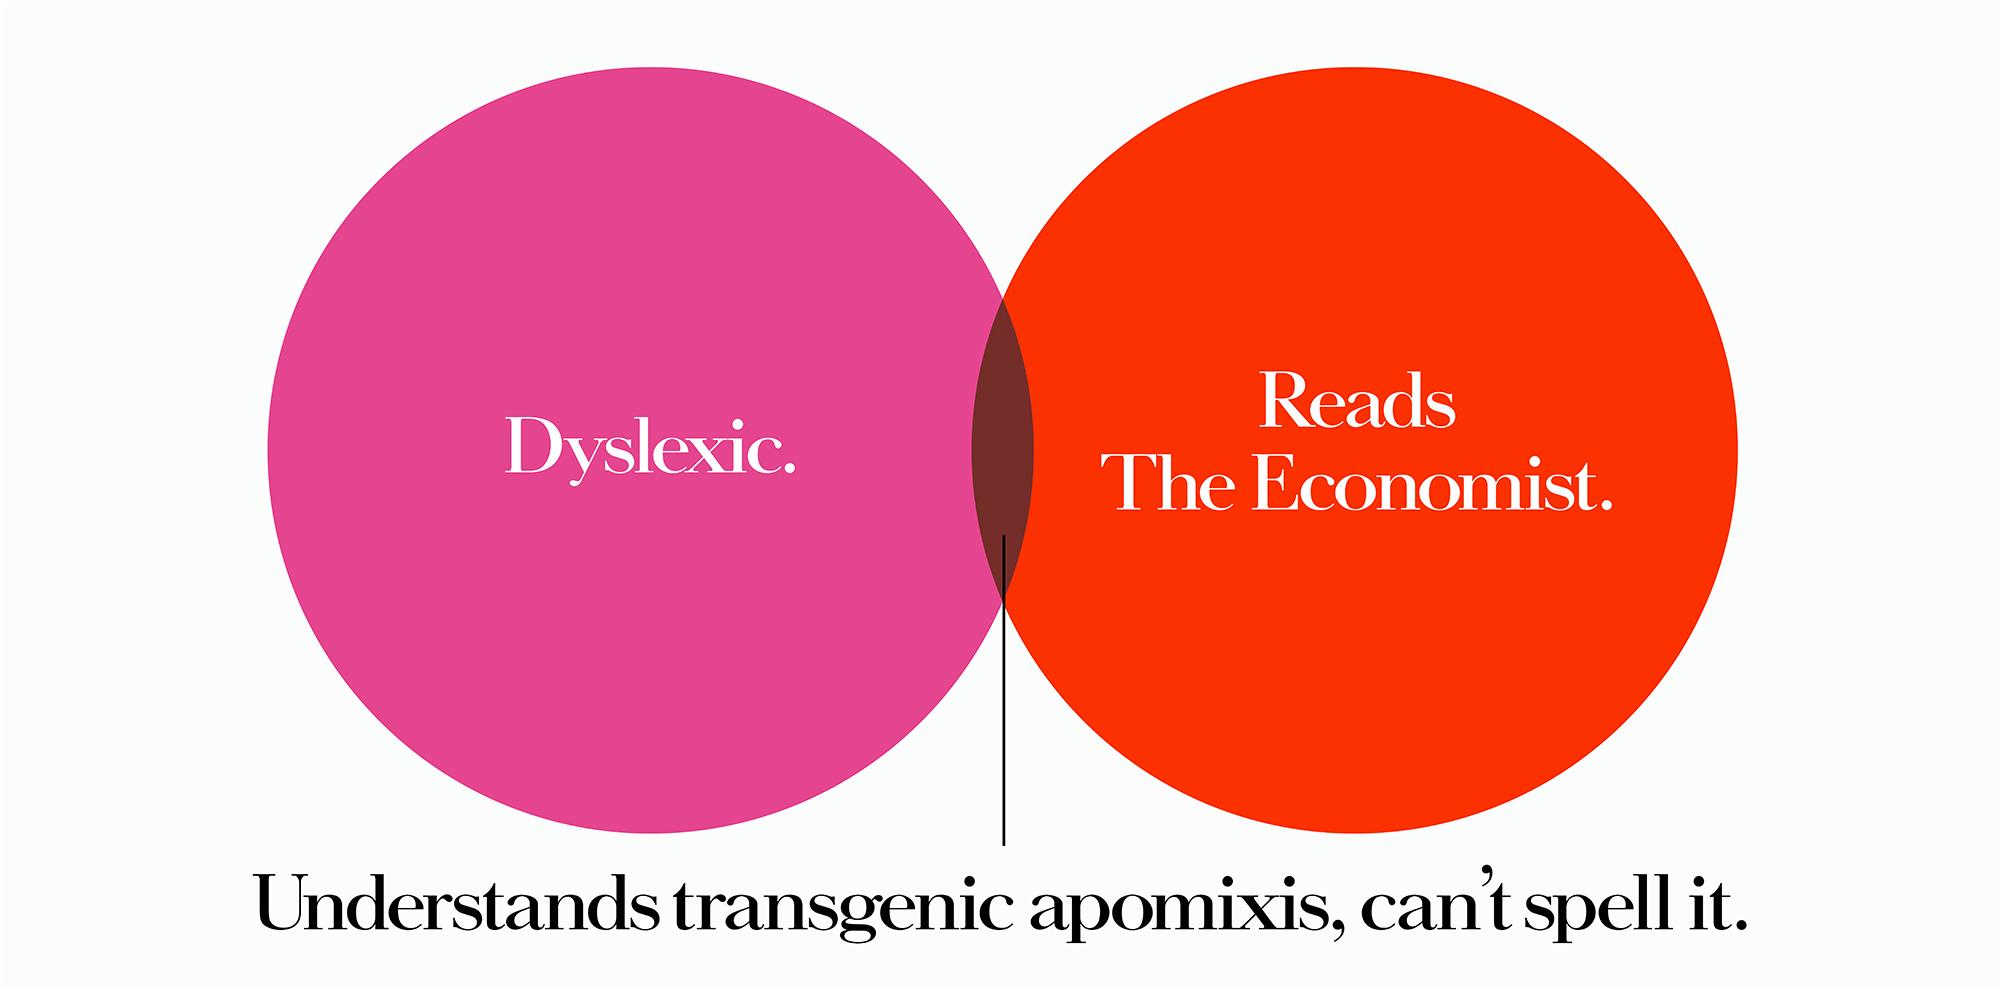 'Dyslexic_' The Economist, Dave Dye, Venn, 48 sheet, AMV-BBDO